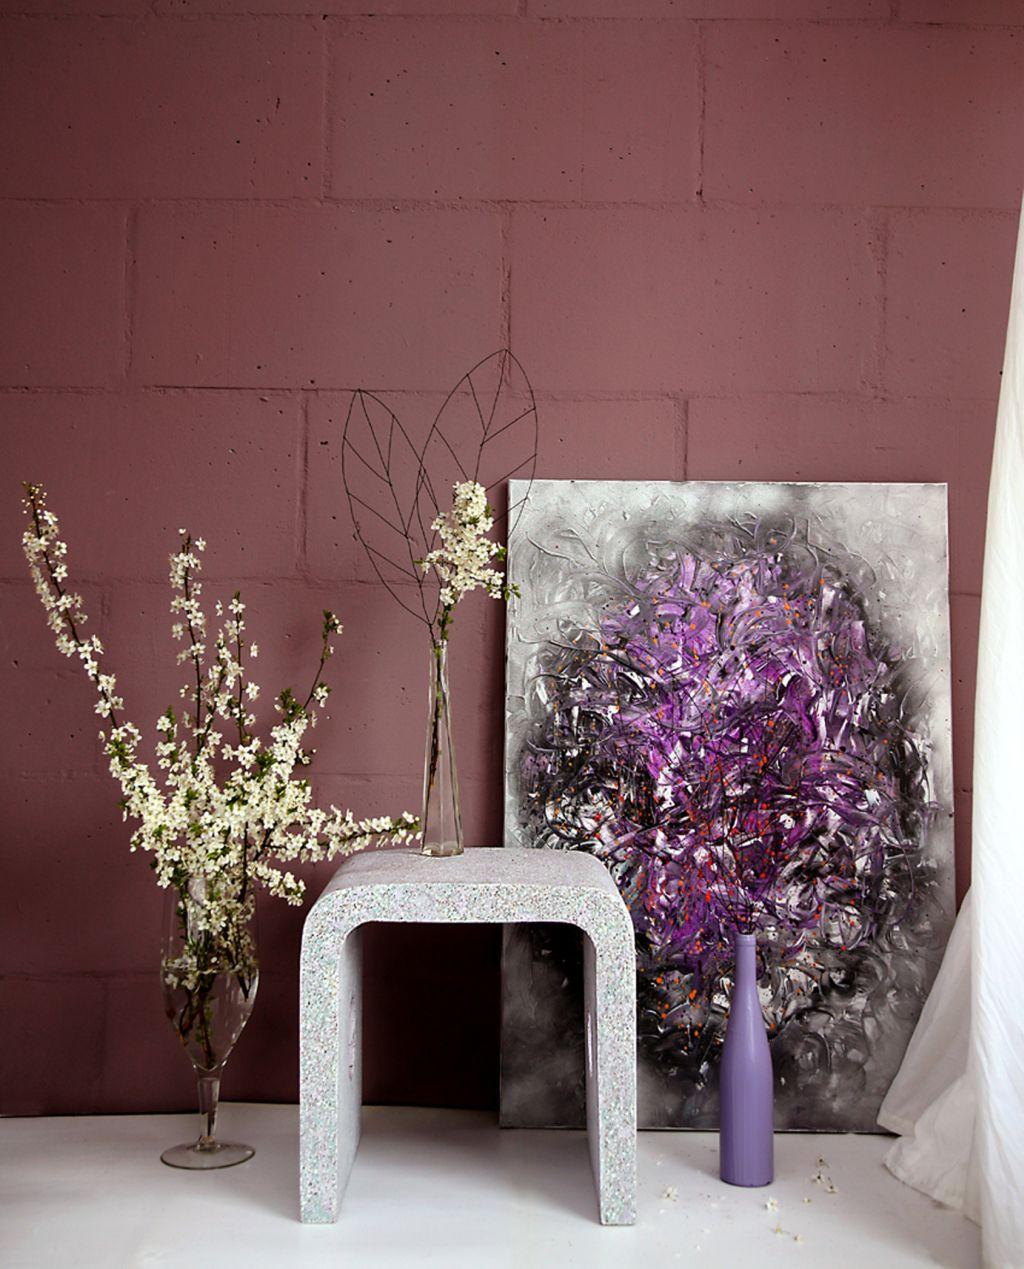 Mic mobilier Lila creat de Valdecor